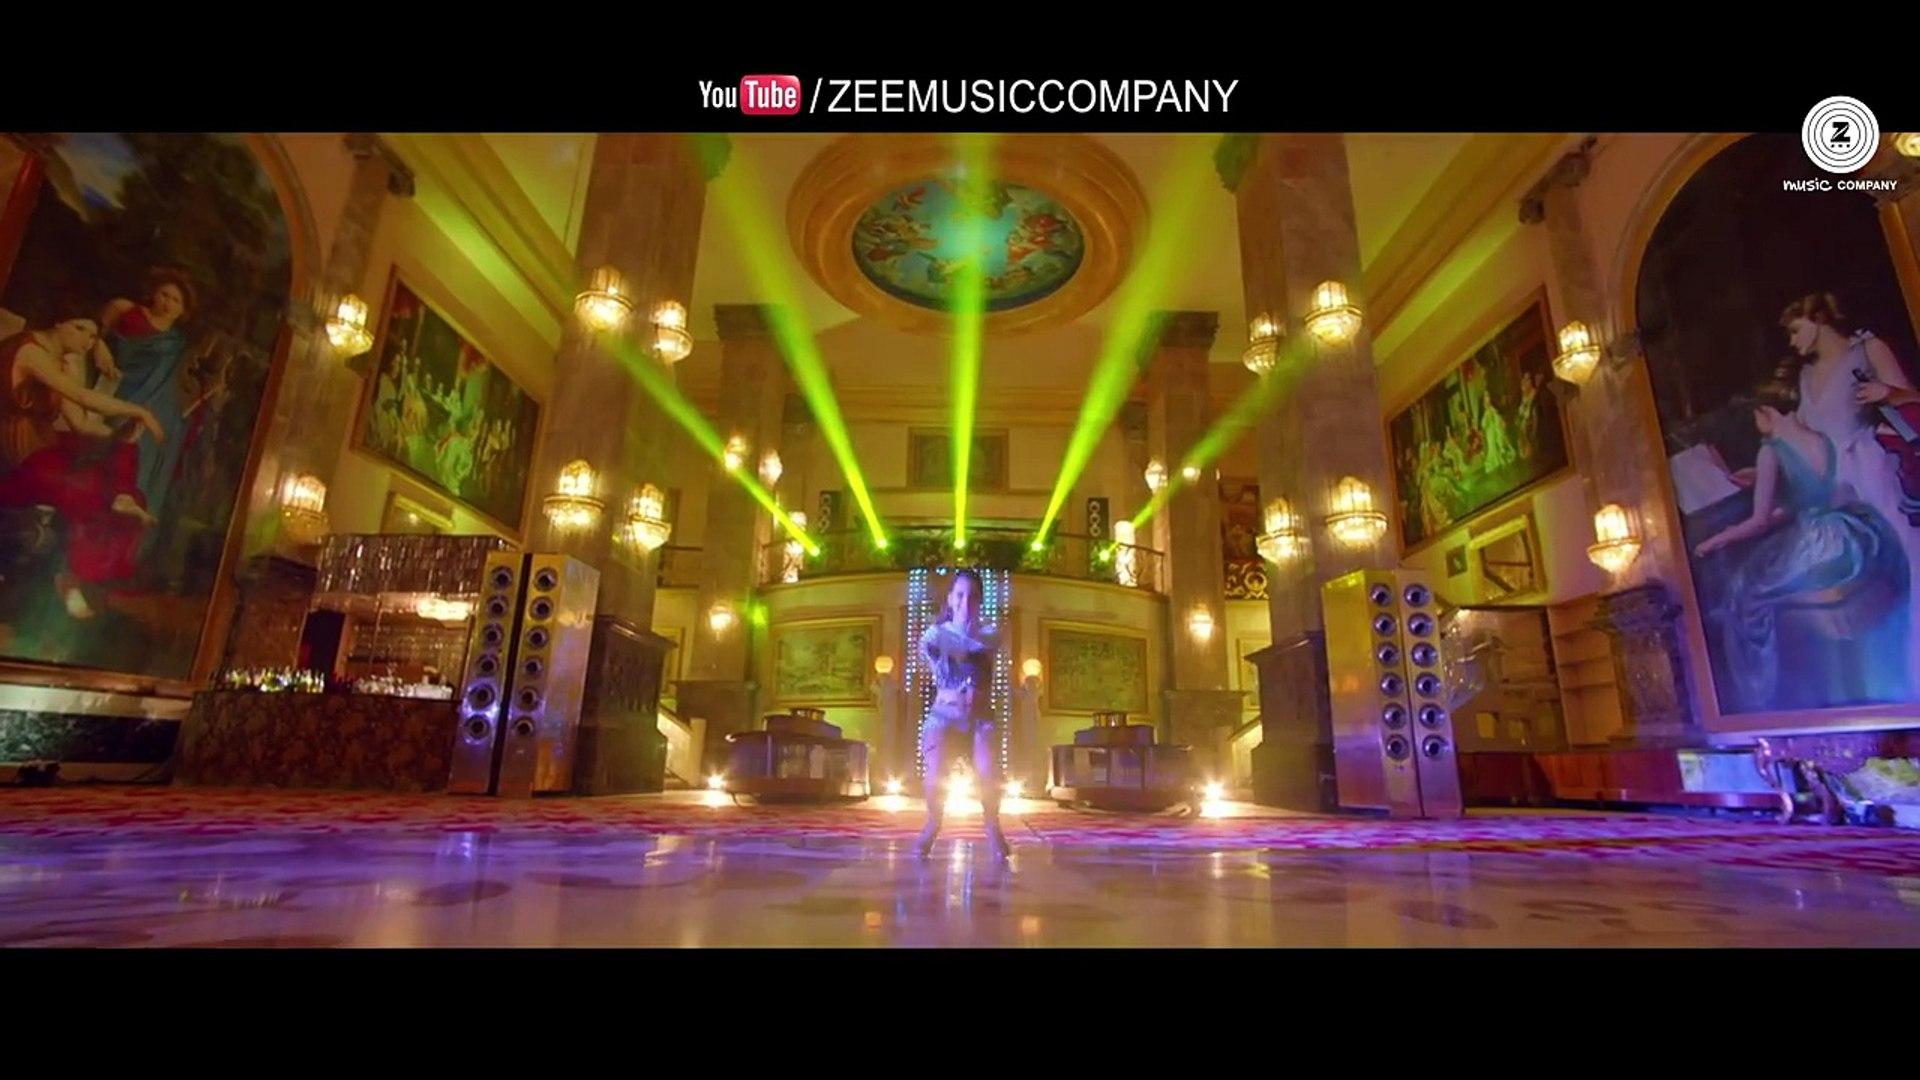 Baby Marvake Maanegi - Raftaar _ Nora Fatehi _ Remo D'souza _ India's first DANCEHALL Song